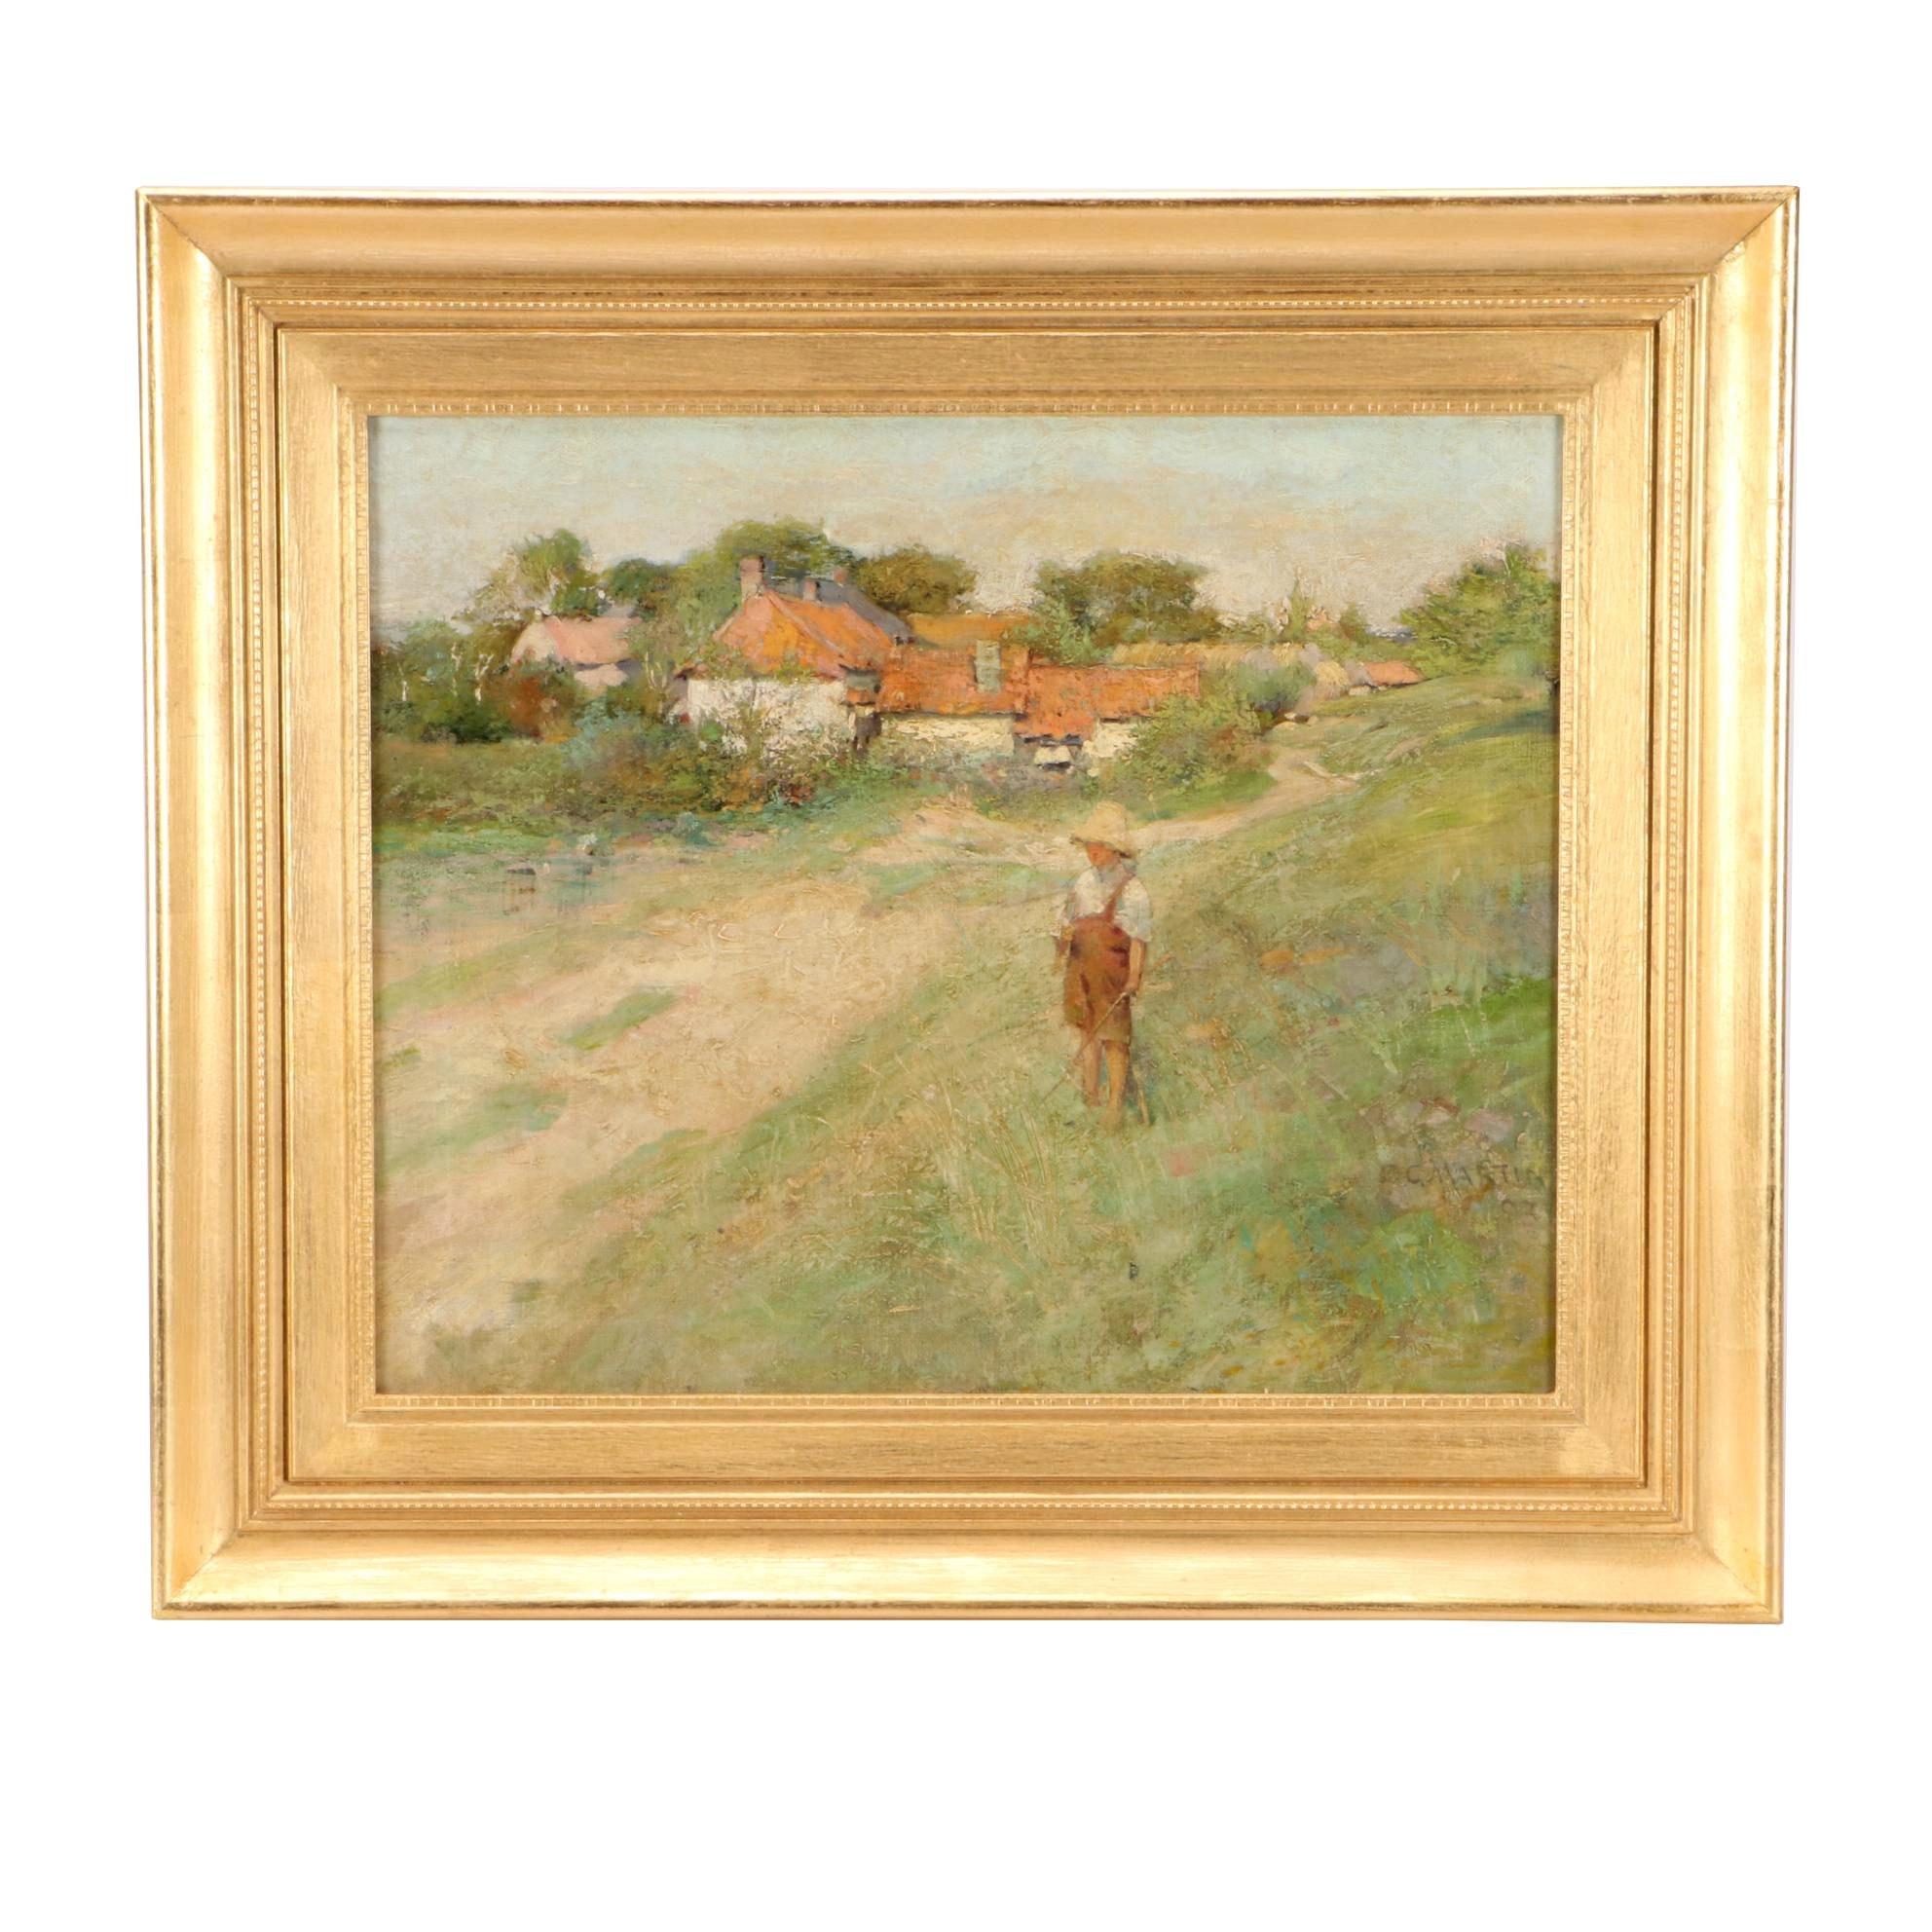 F. C. Martin 1903 Impressionist Oil Landscape with Boy